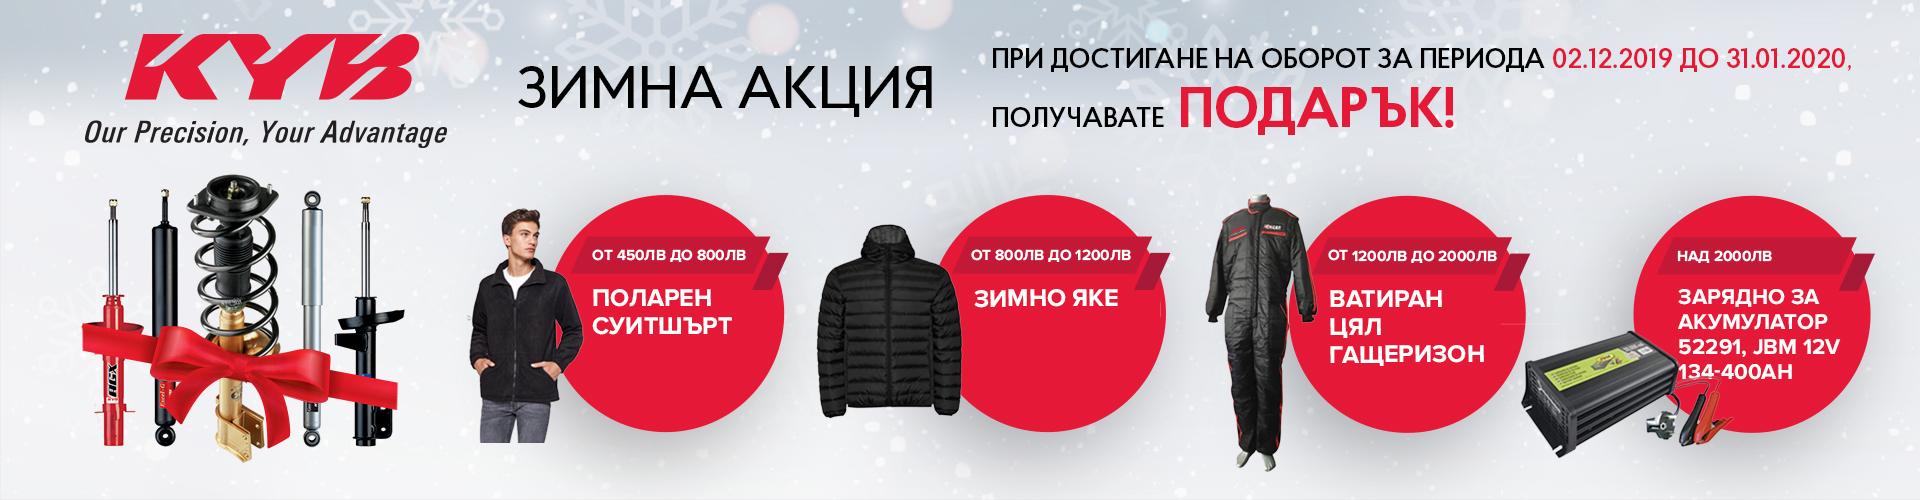 promo_kayaba_02.12.2019-31.01.2020_banner.jpg